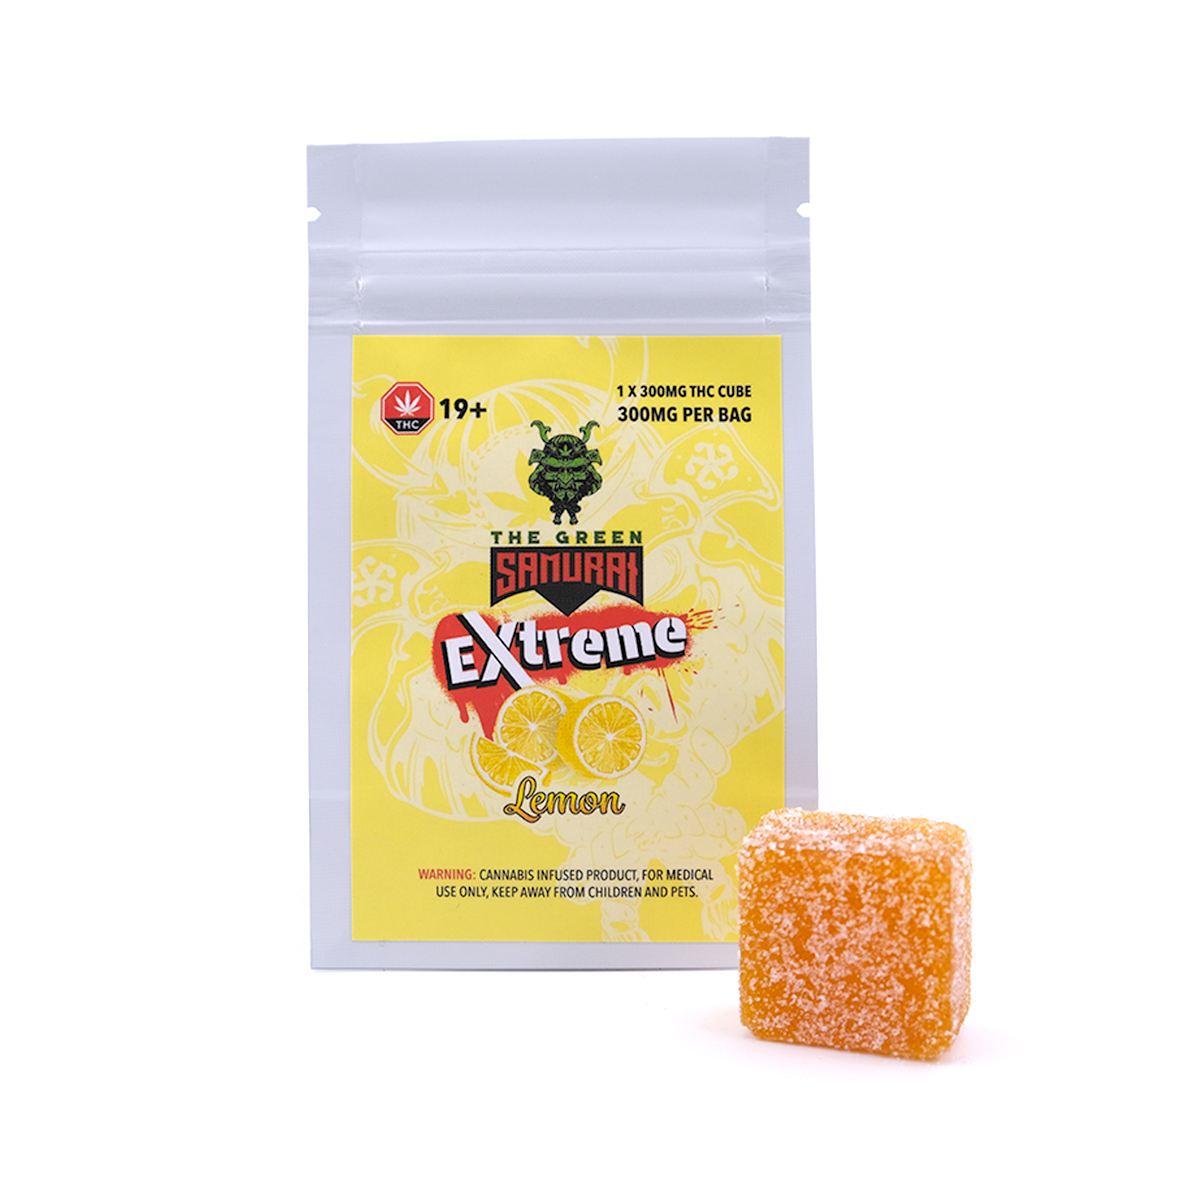 Buy The Green Samurai Extreme 300mg THC - Lemon